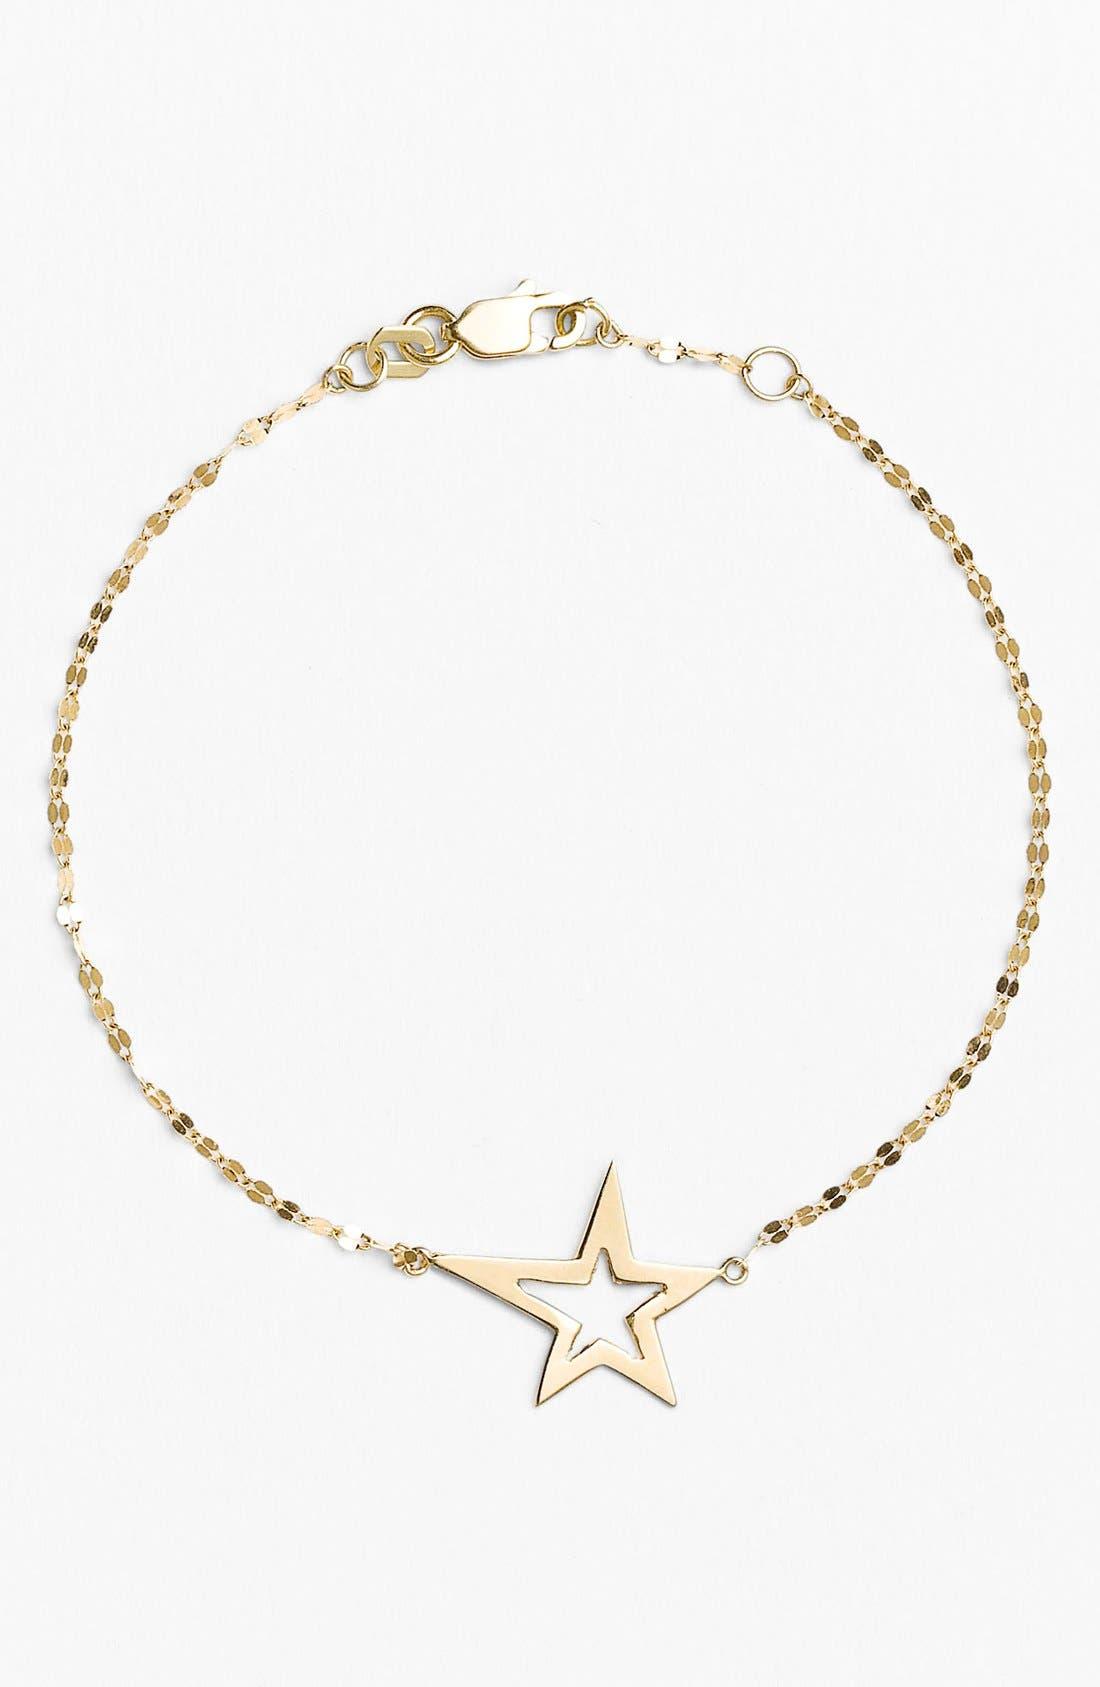 Main Image - Lana Jewelry Star Station Bracelet